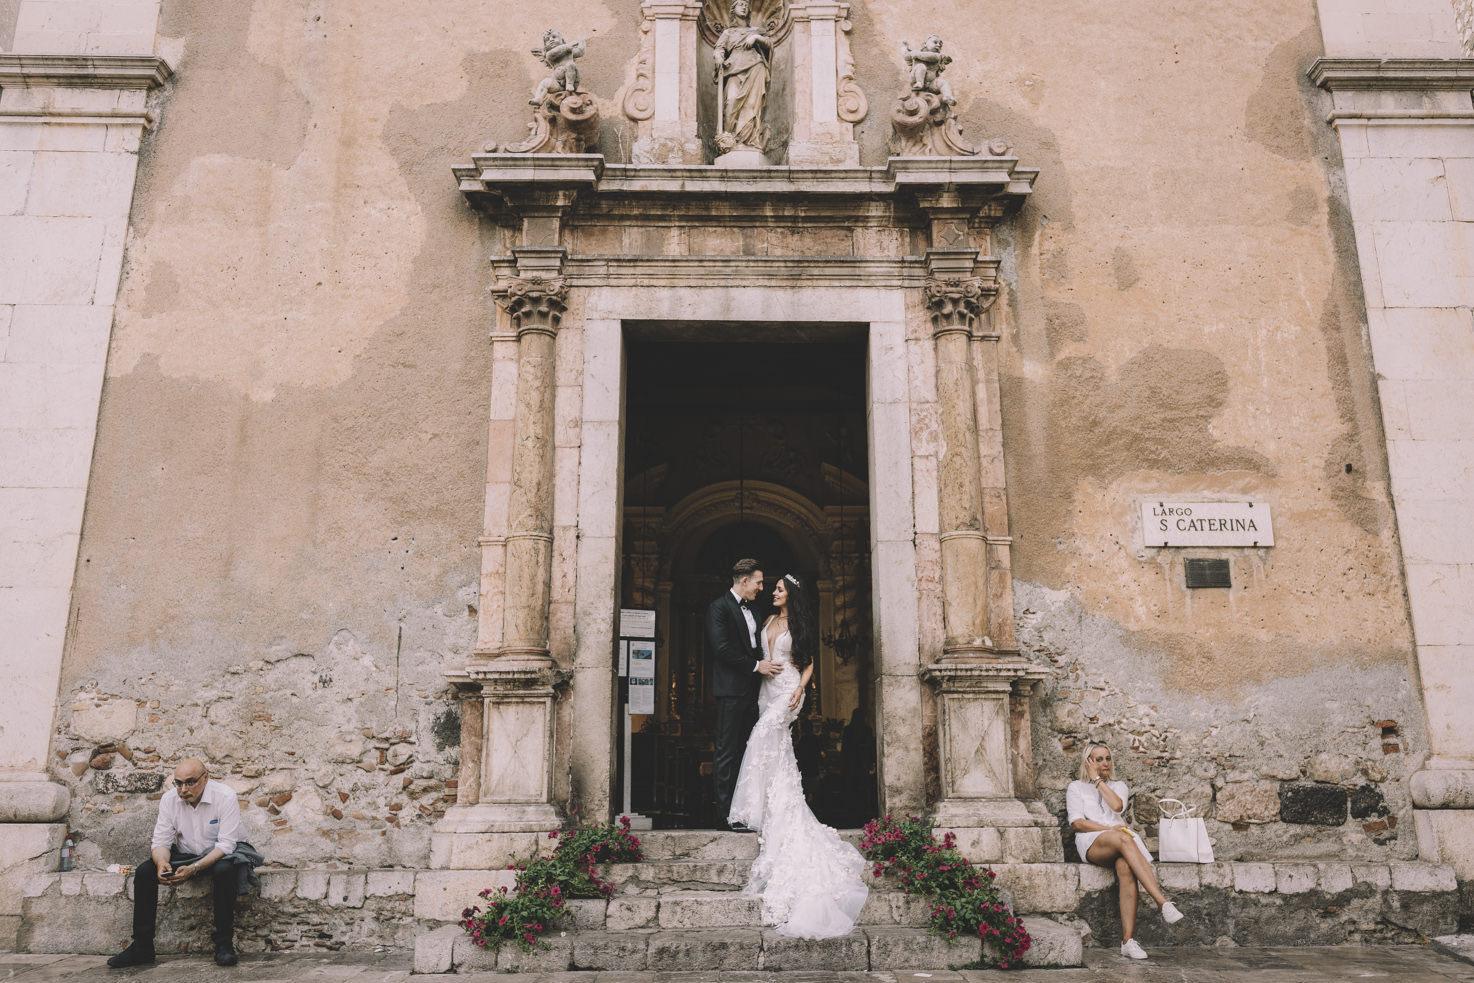 Baroque church in Sicily